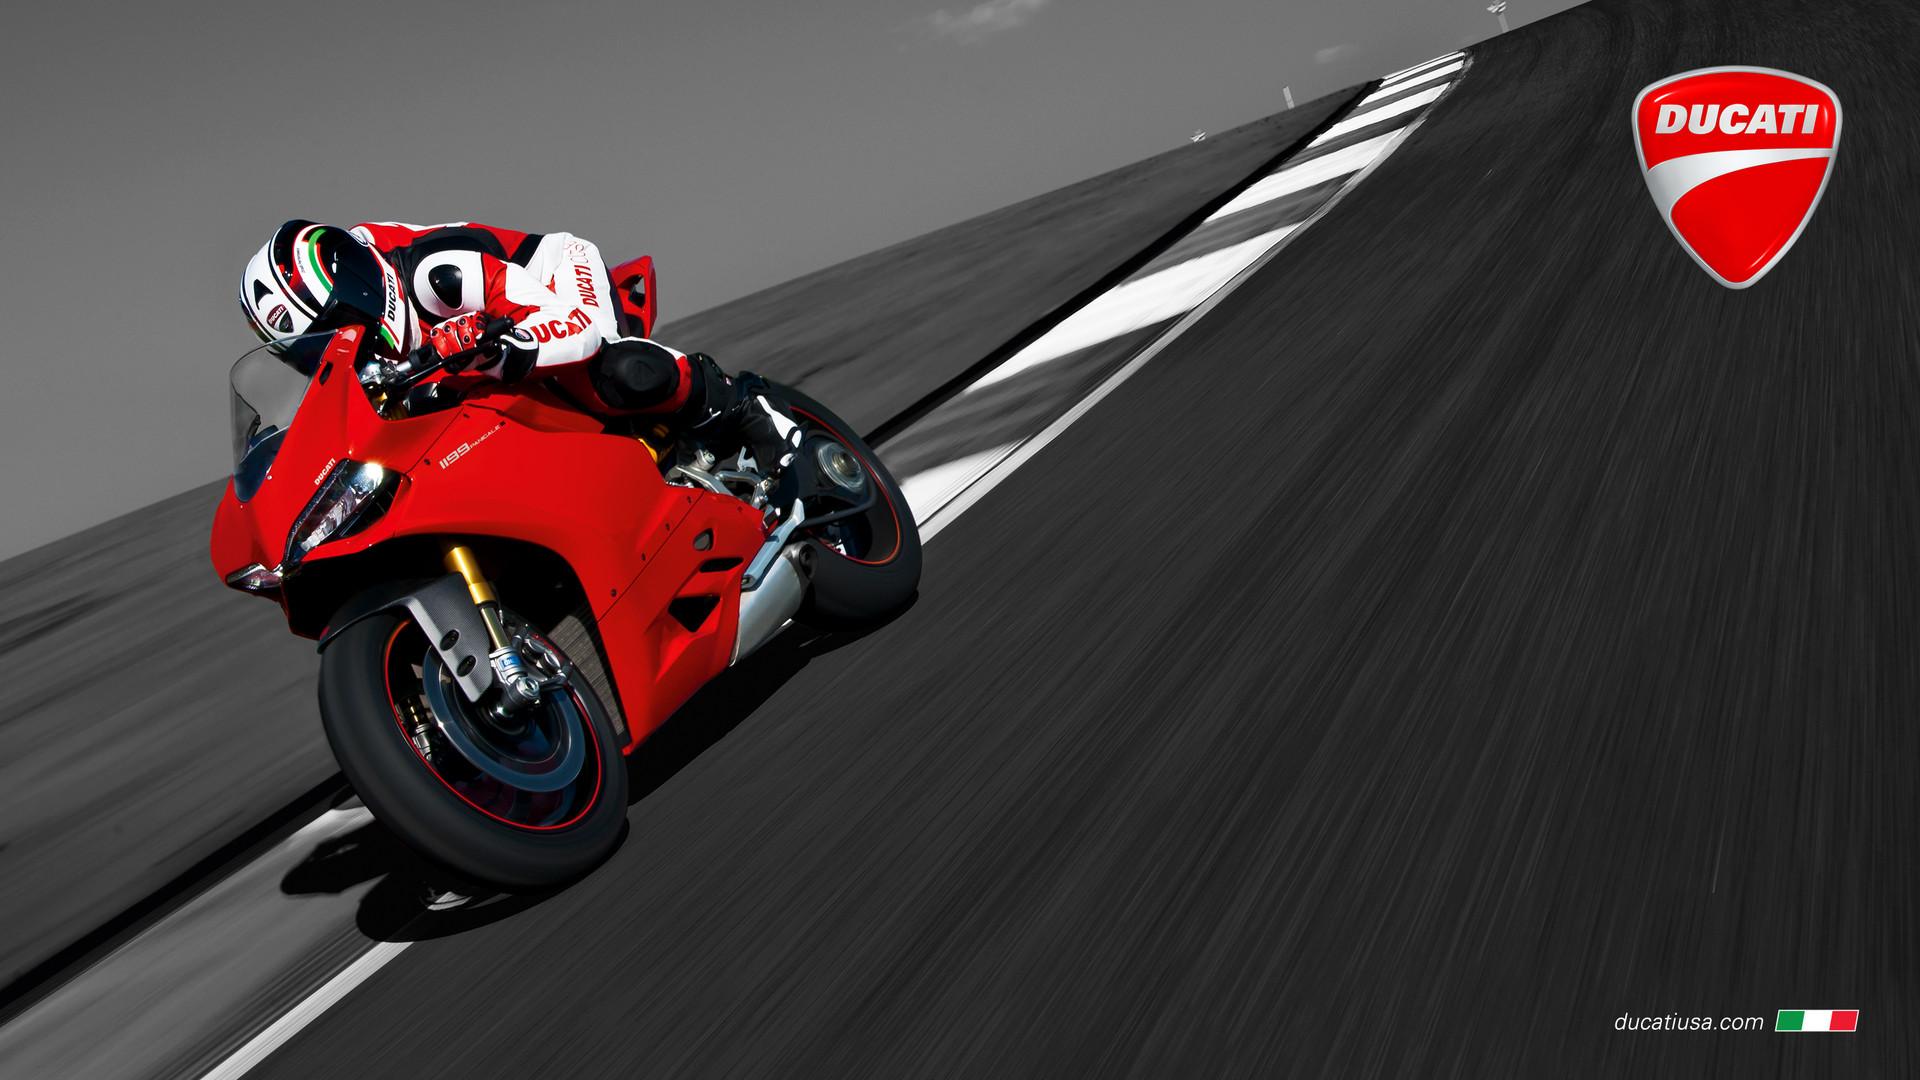 Pin 2012 Ducati 1199 Panigale Wallpaper 10 1920x1080